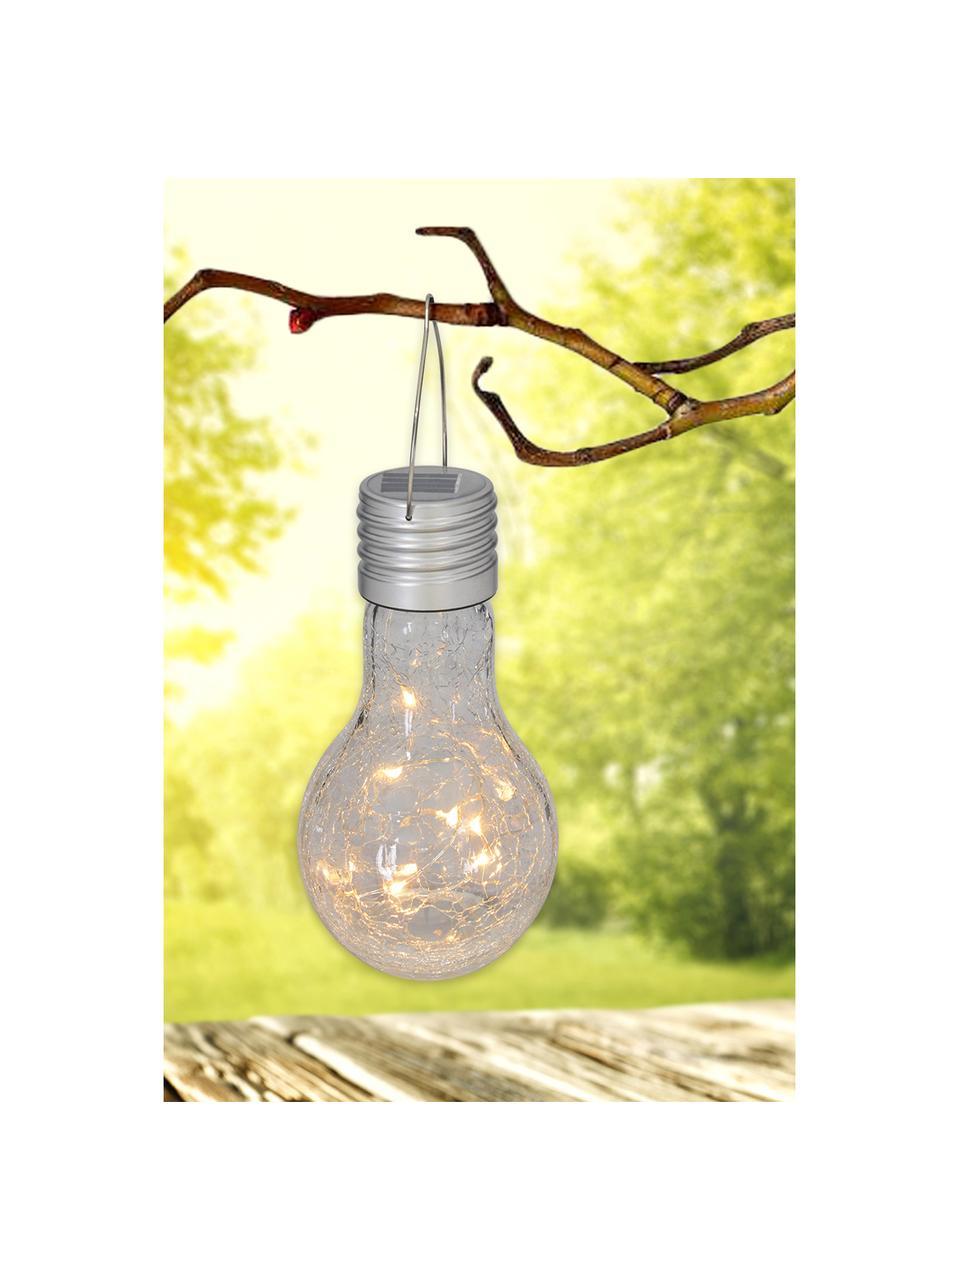 Solar hanglampen Martin, 3 stuks, Peertje: glas, Lampenkap: transparant met splintereffect Lamphouder: nikkelkleurig, Ø 10 x H 20 cm